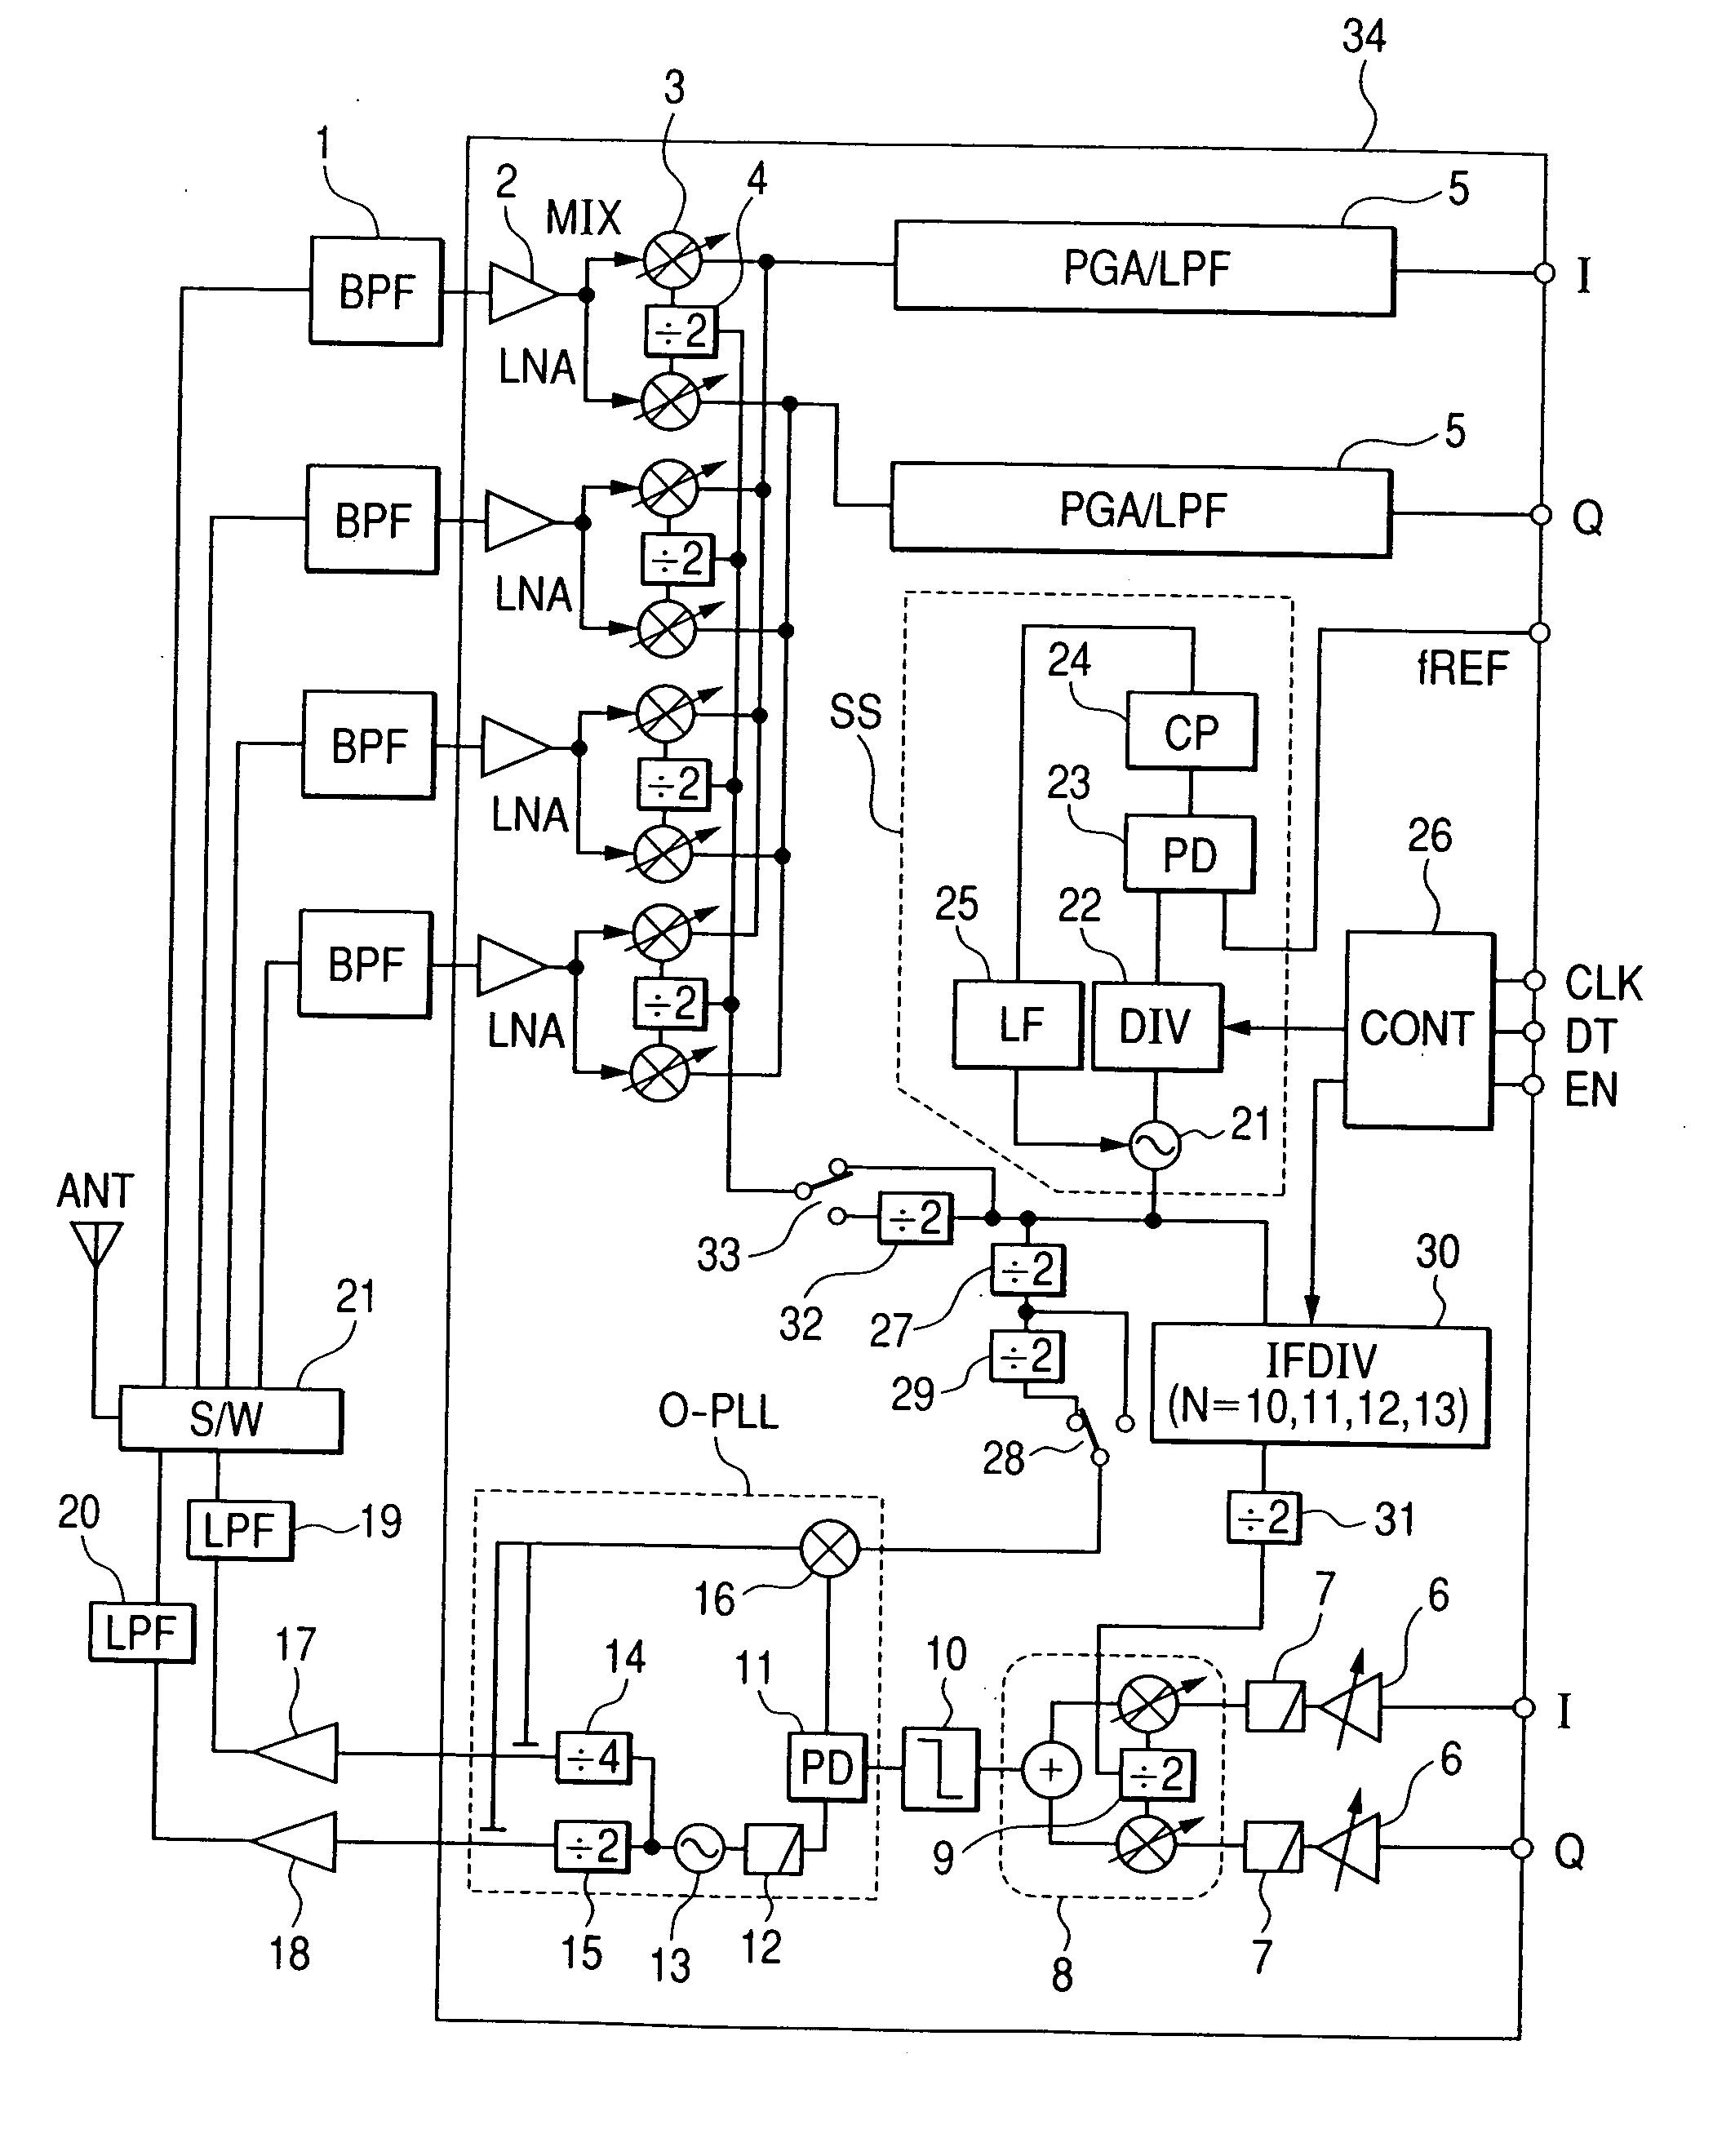 brevet us20050287964 wireless transmitter circuit and transceiver RF Transmitter Block Diagram patent drawing